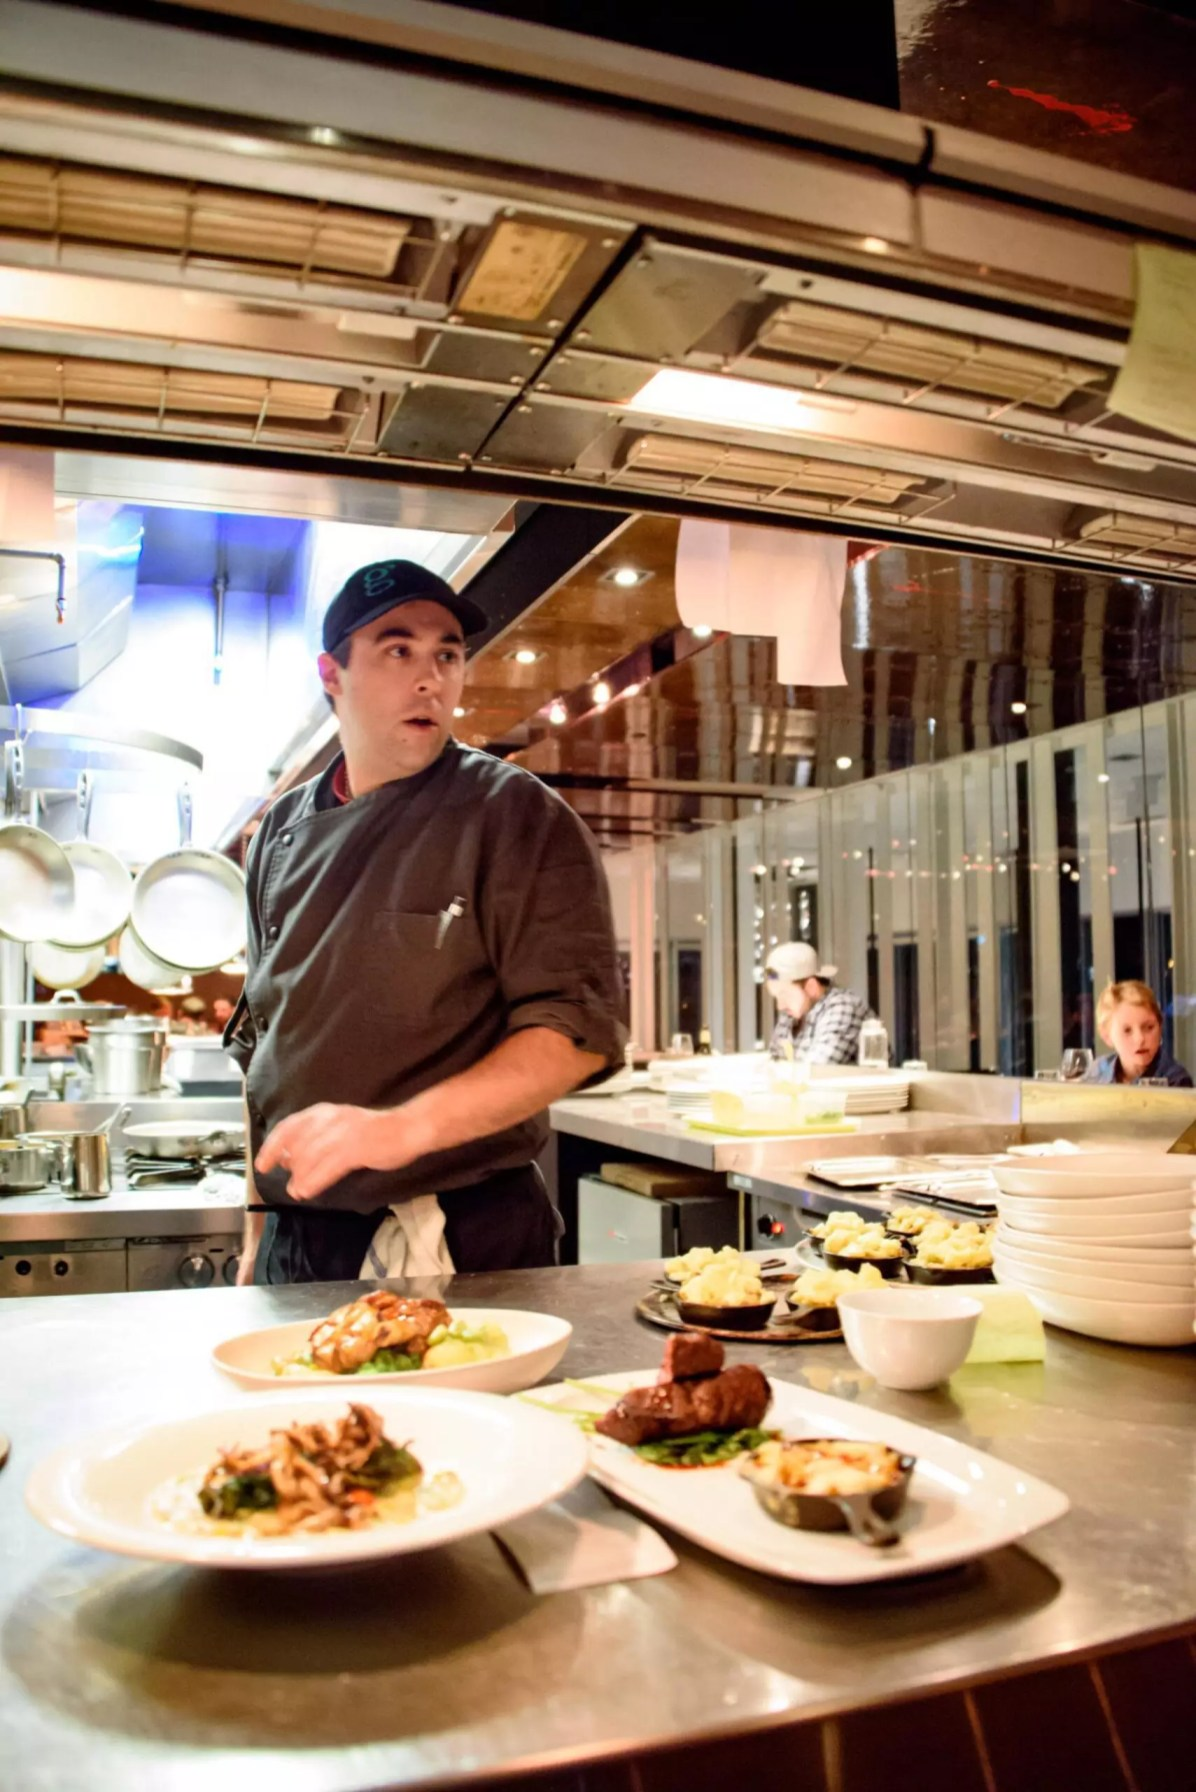 Quebec food and drink: Chef Sylvain Dervieux in his kitchen